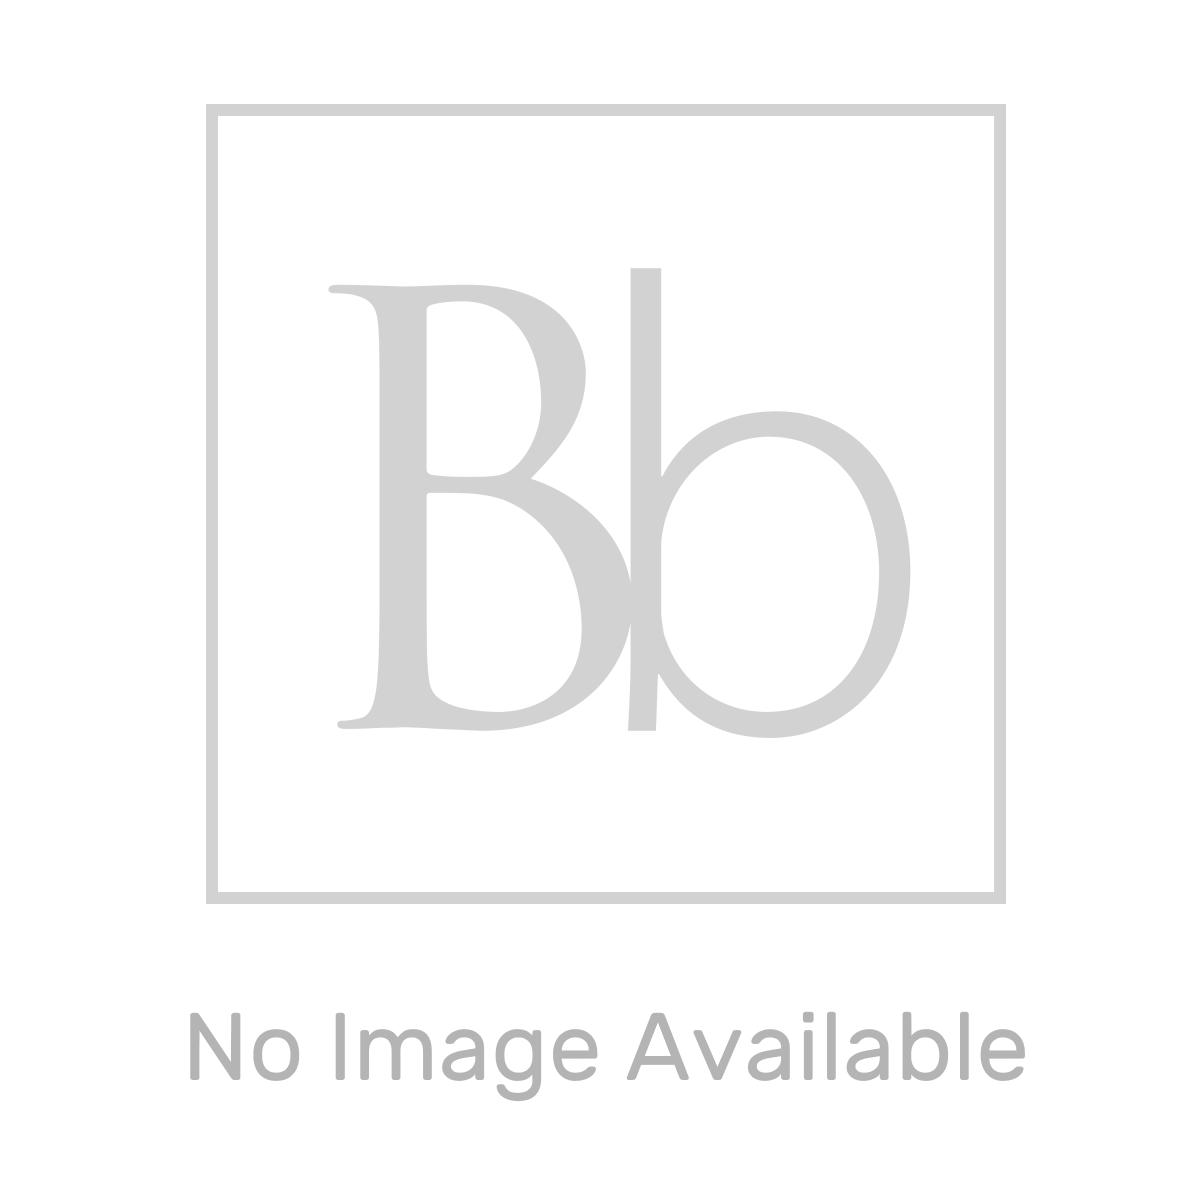 RAK Resort Maxi Close Coupled Toilet with Sandwich Soft Close Seat Measurements